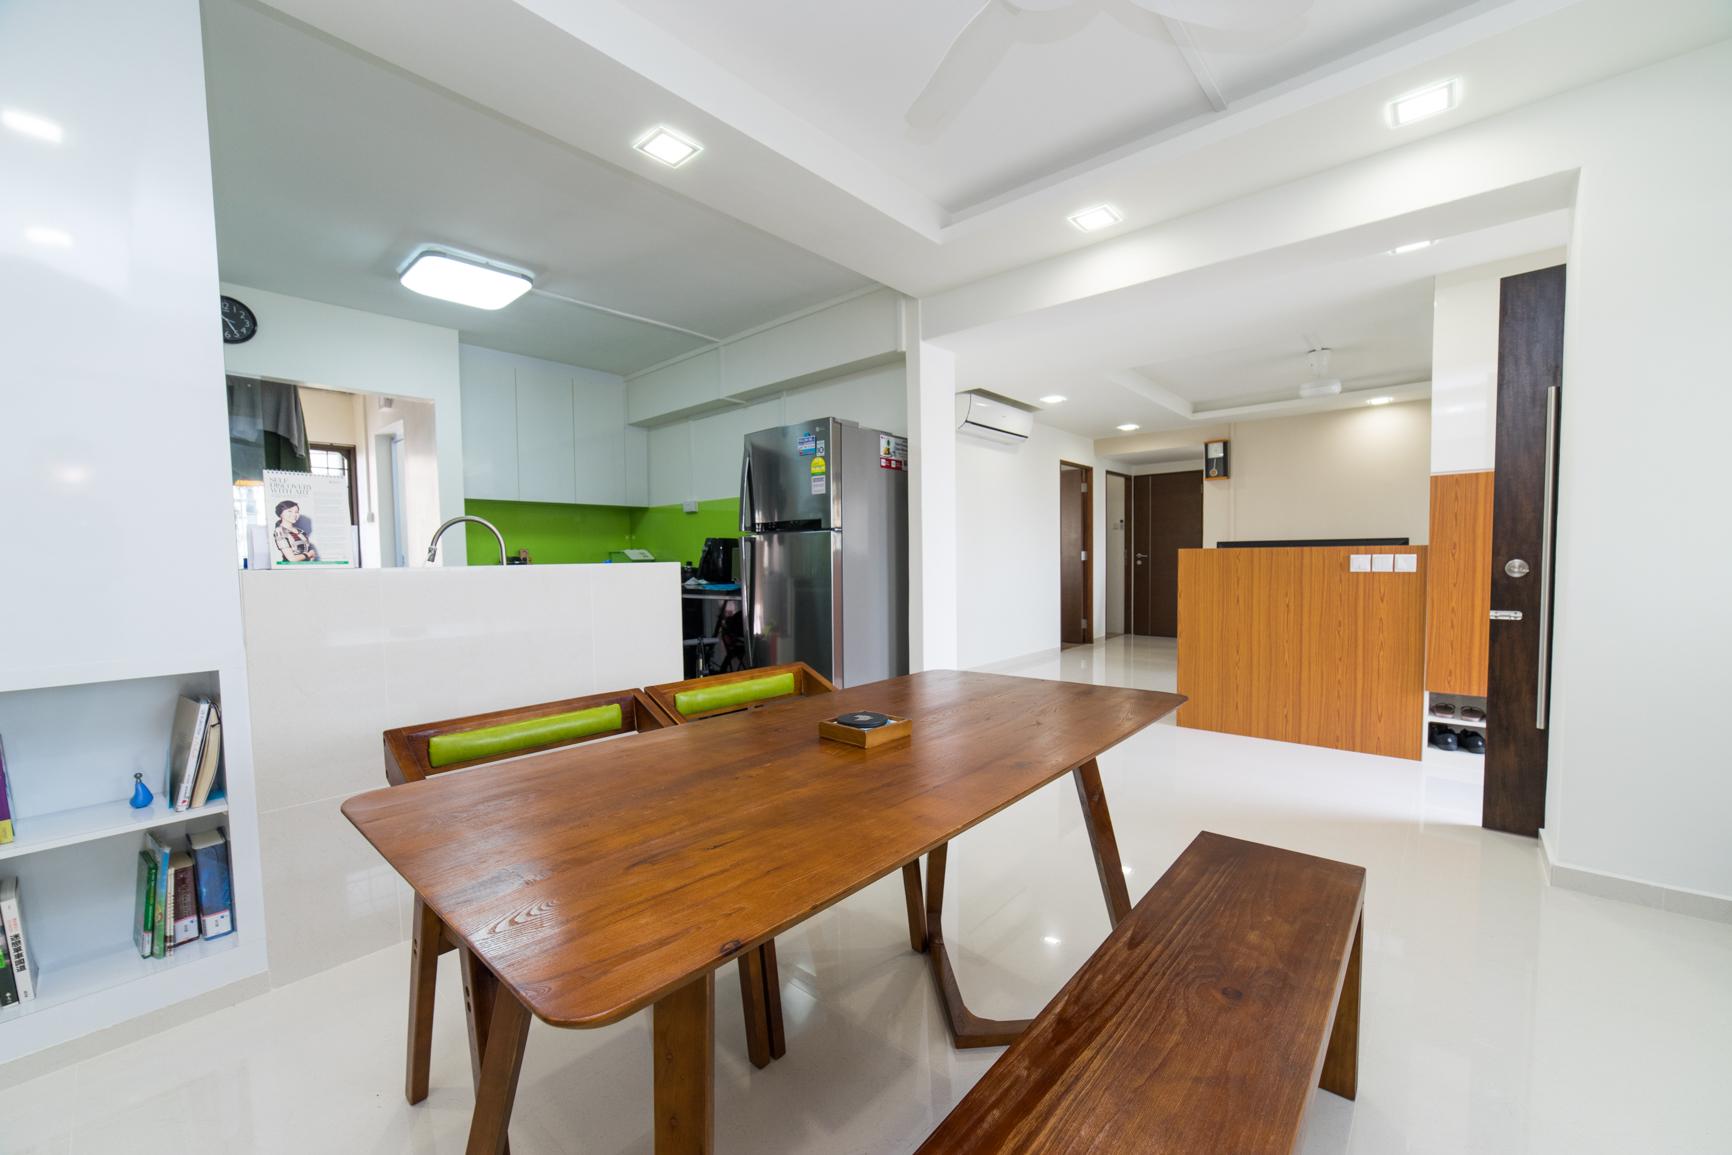 Renovation at Pasir Ris